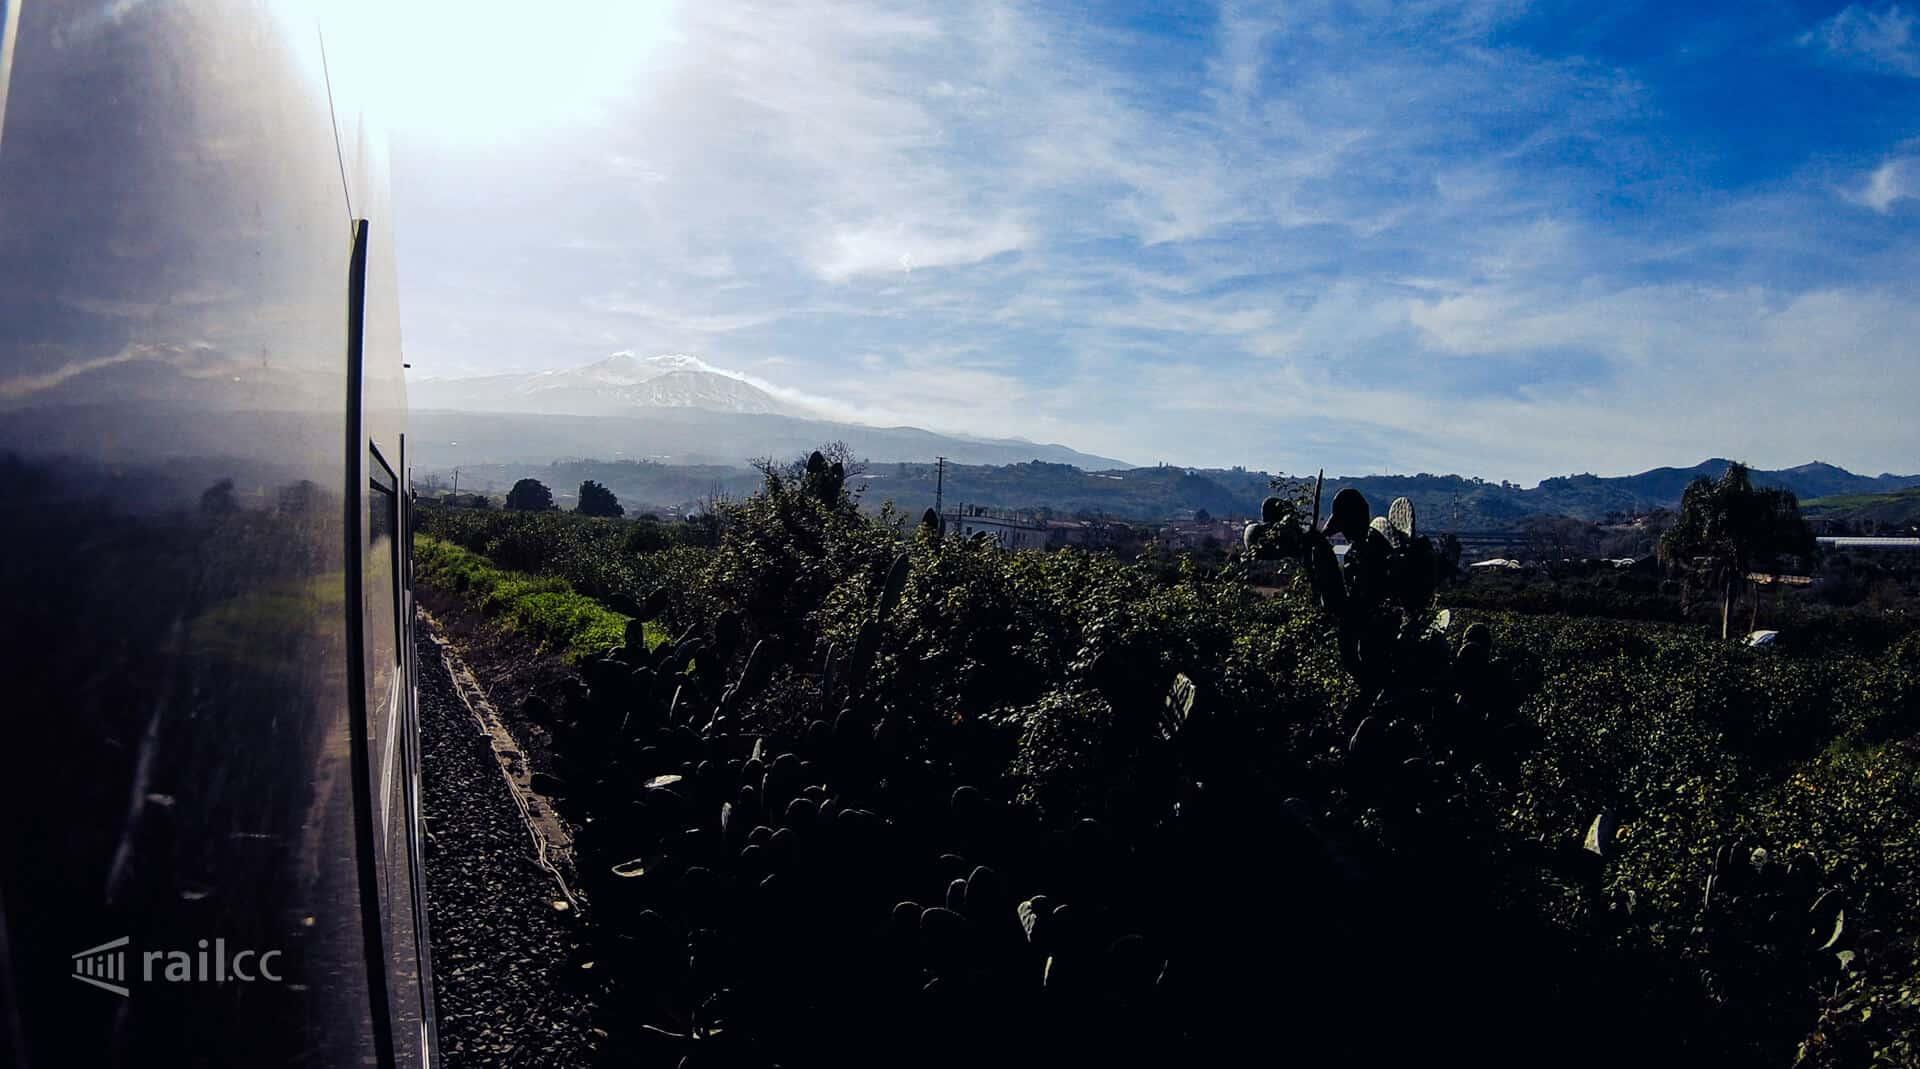 The night train arrives at volcano Etna.